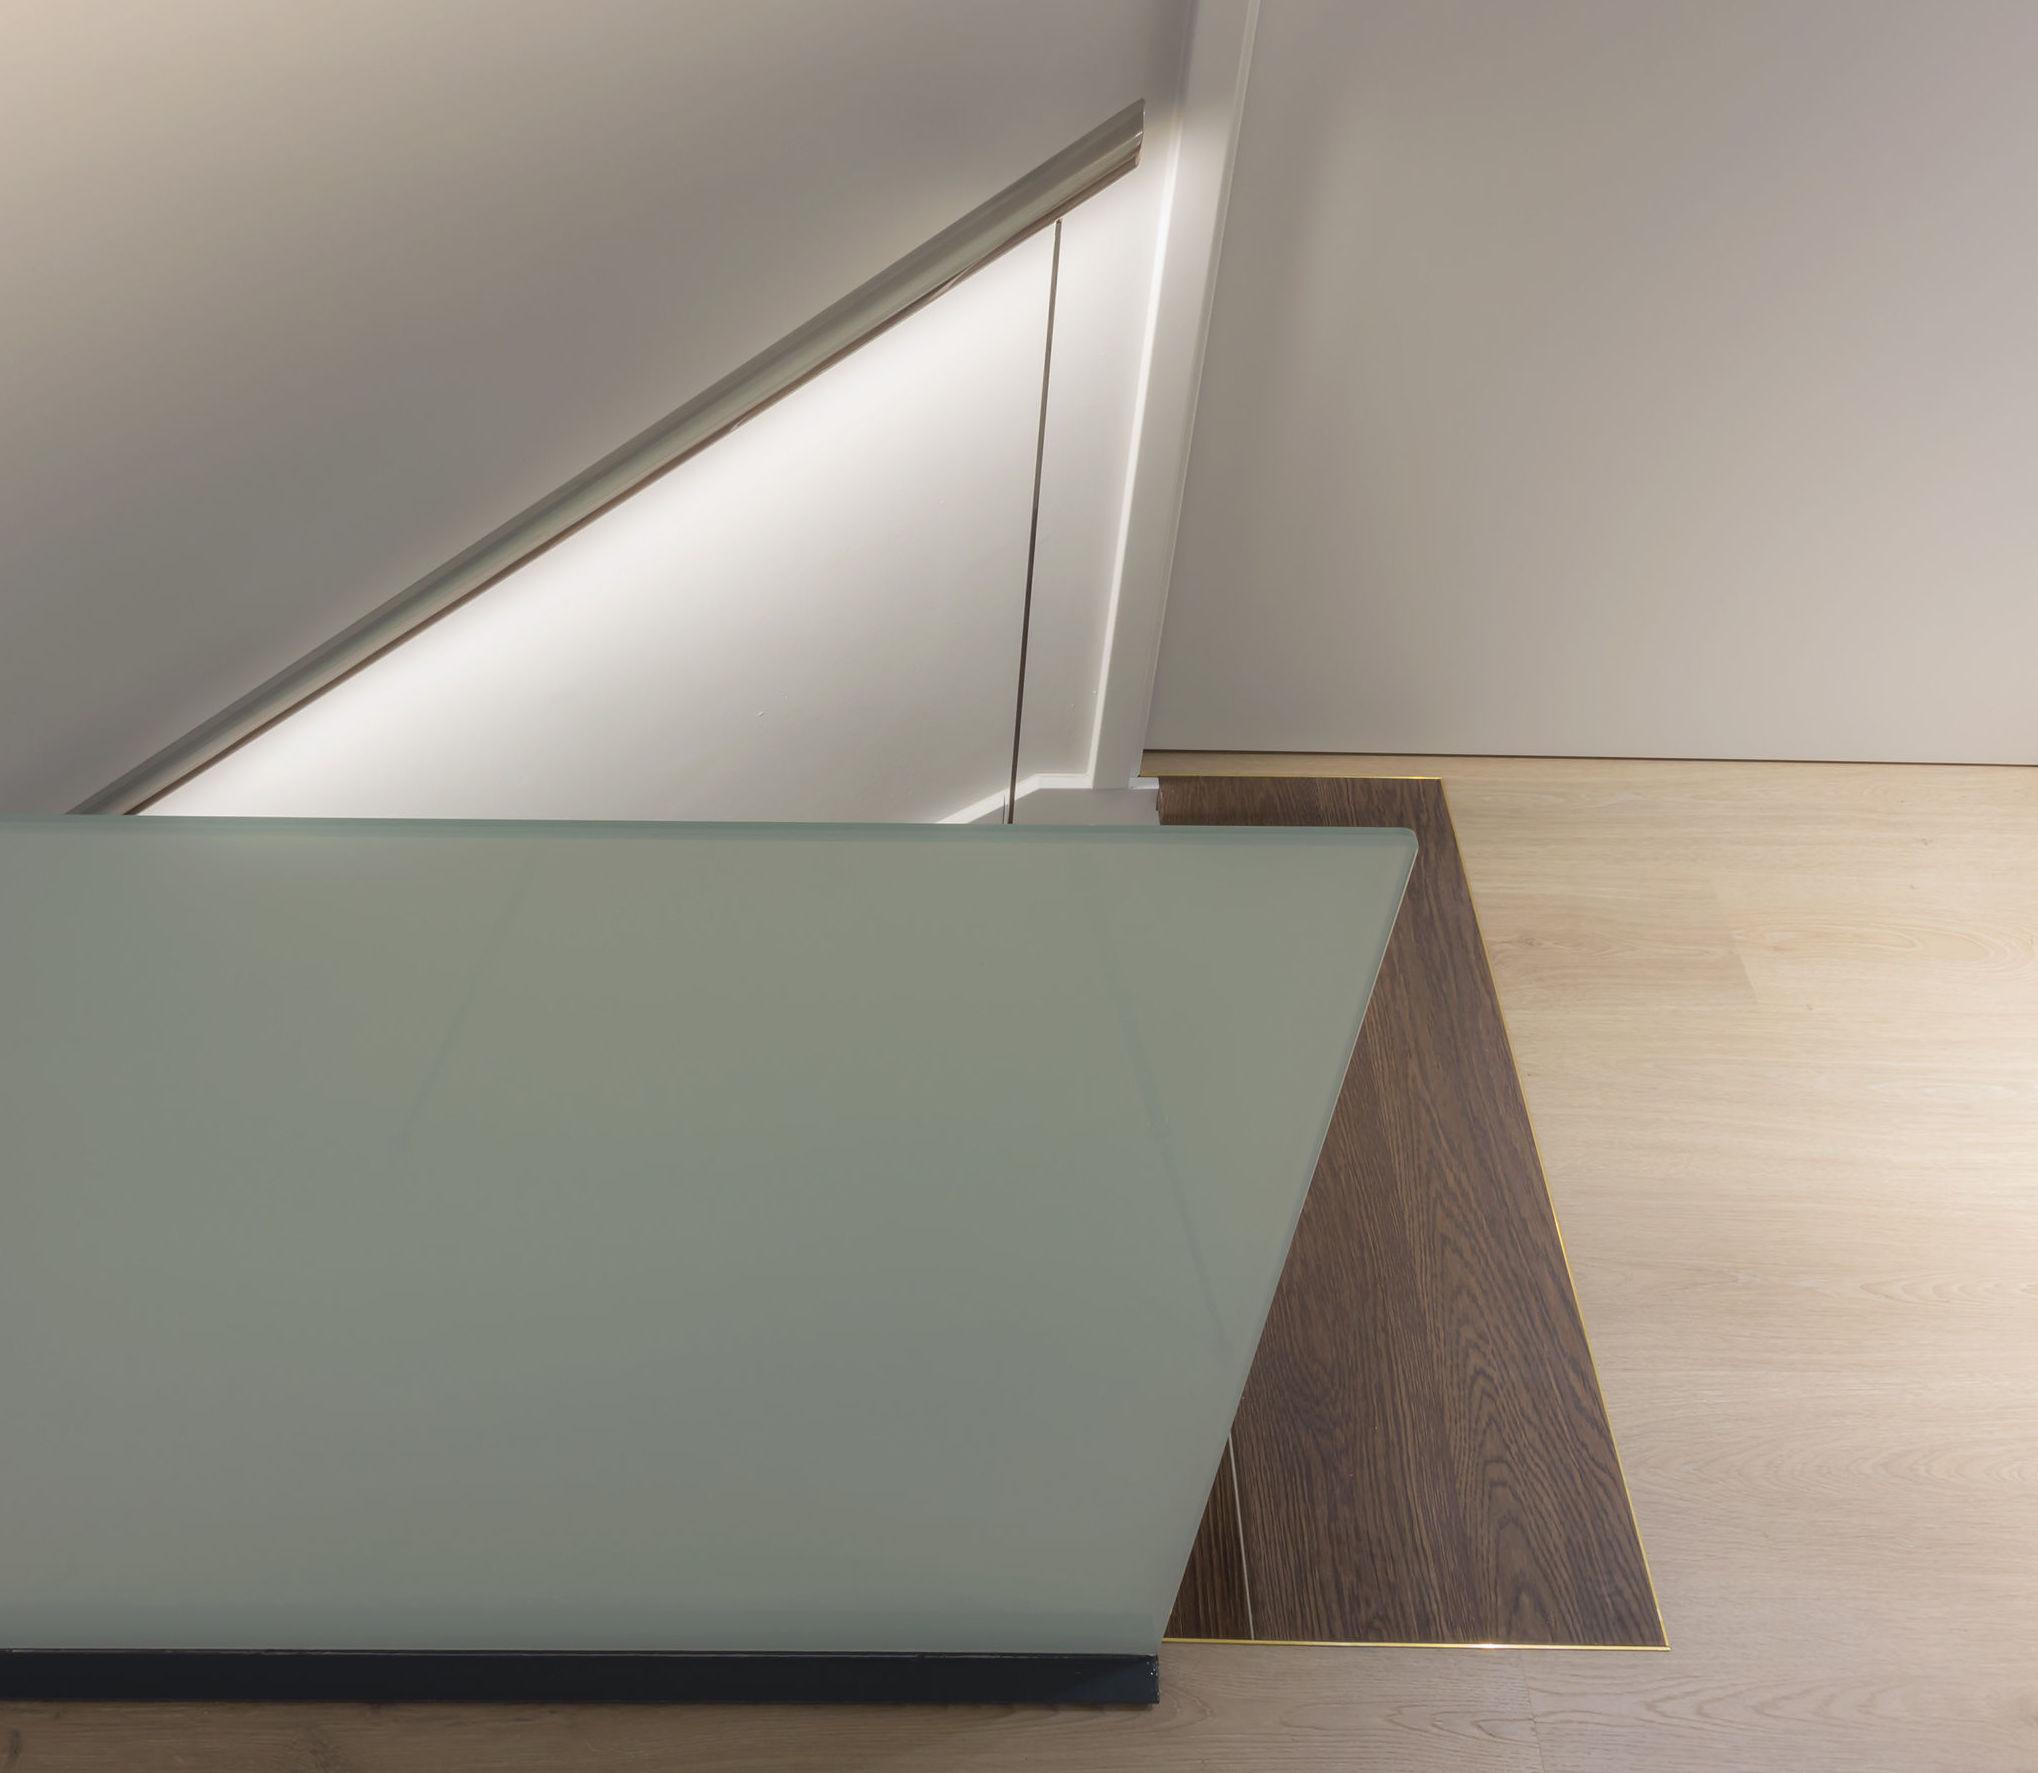 Duplex en Sitges #fpmarquitectura